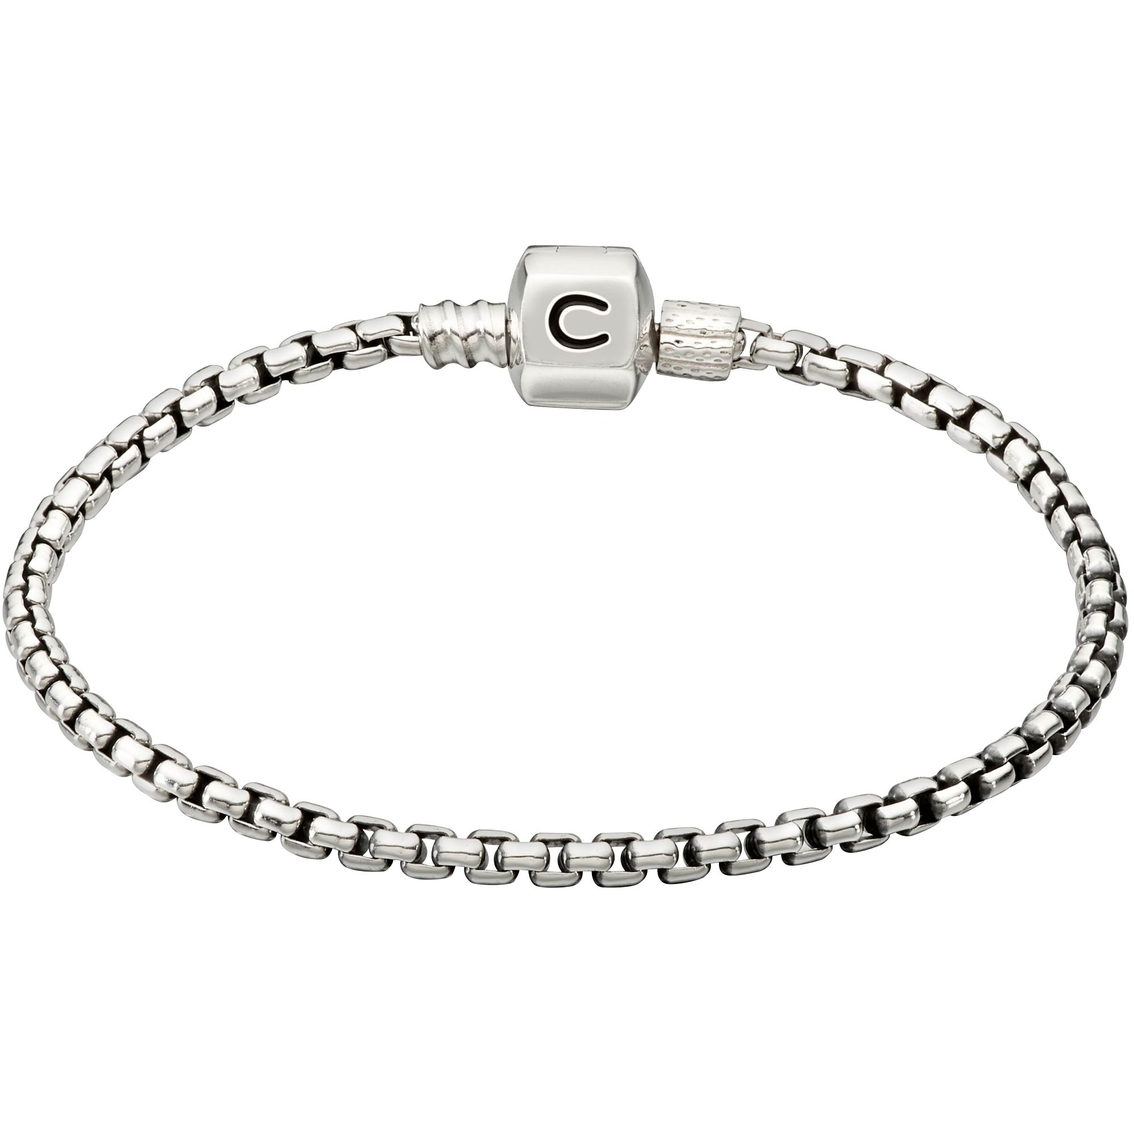 Chamilia Sterling Silver Box Chain Bracelet